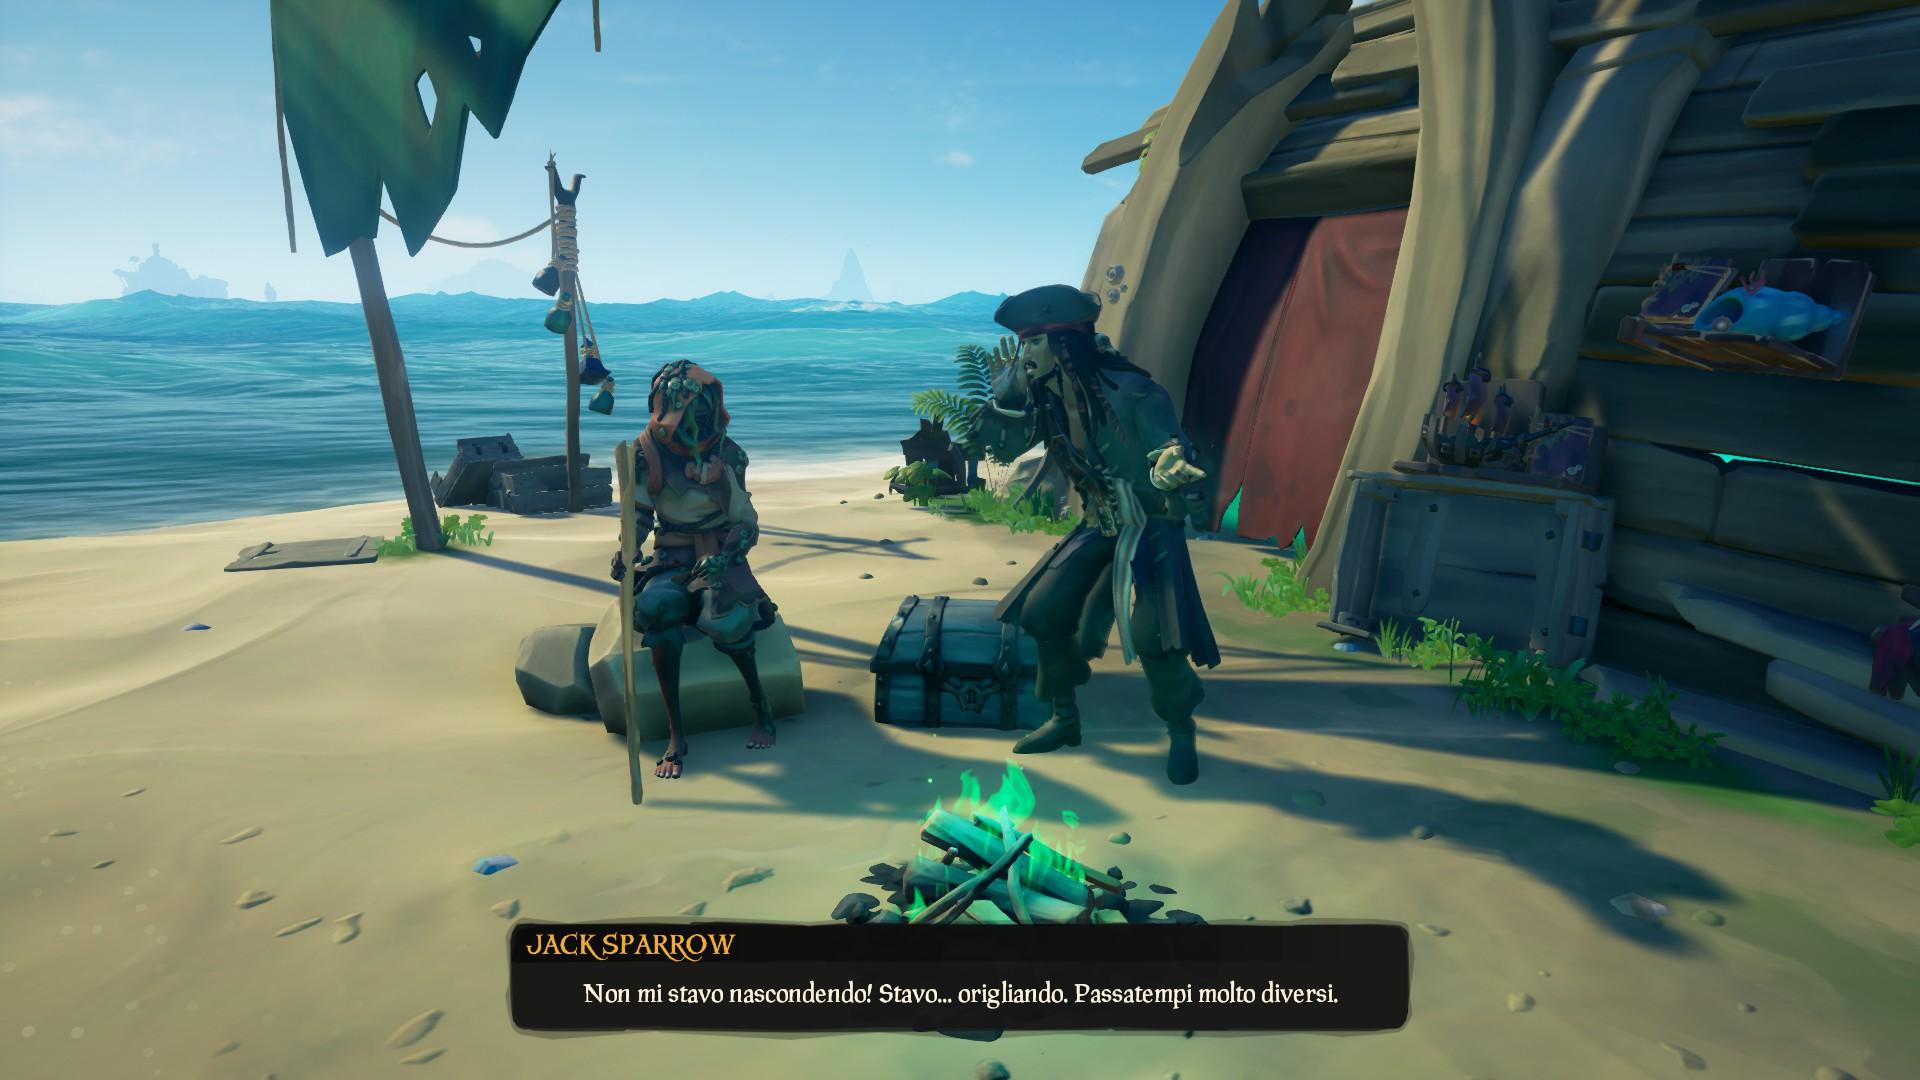 Fratellanza Oscura: Jack Sparrow